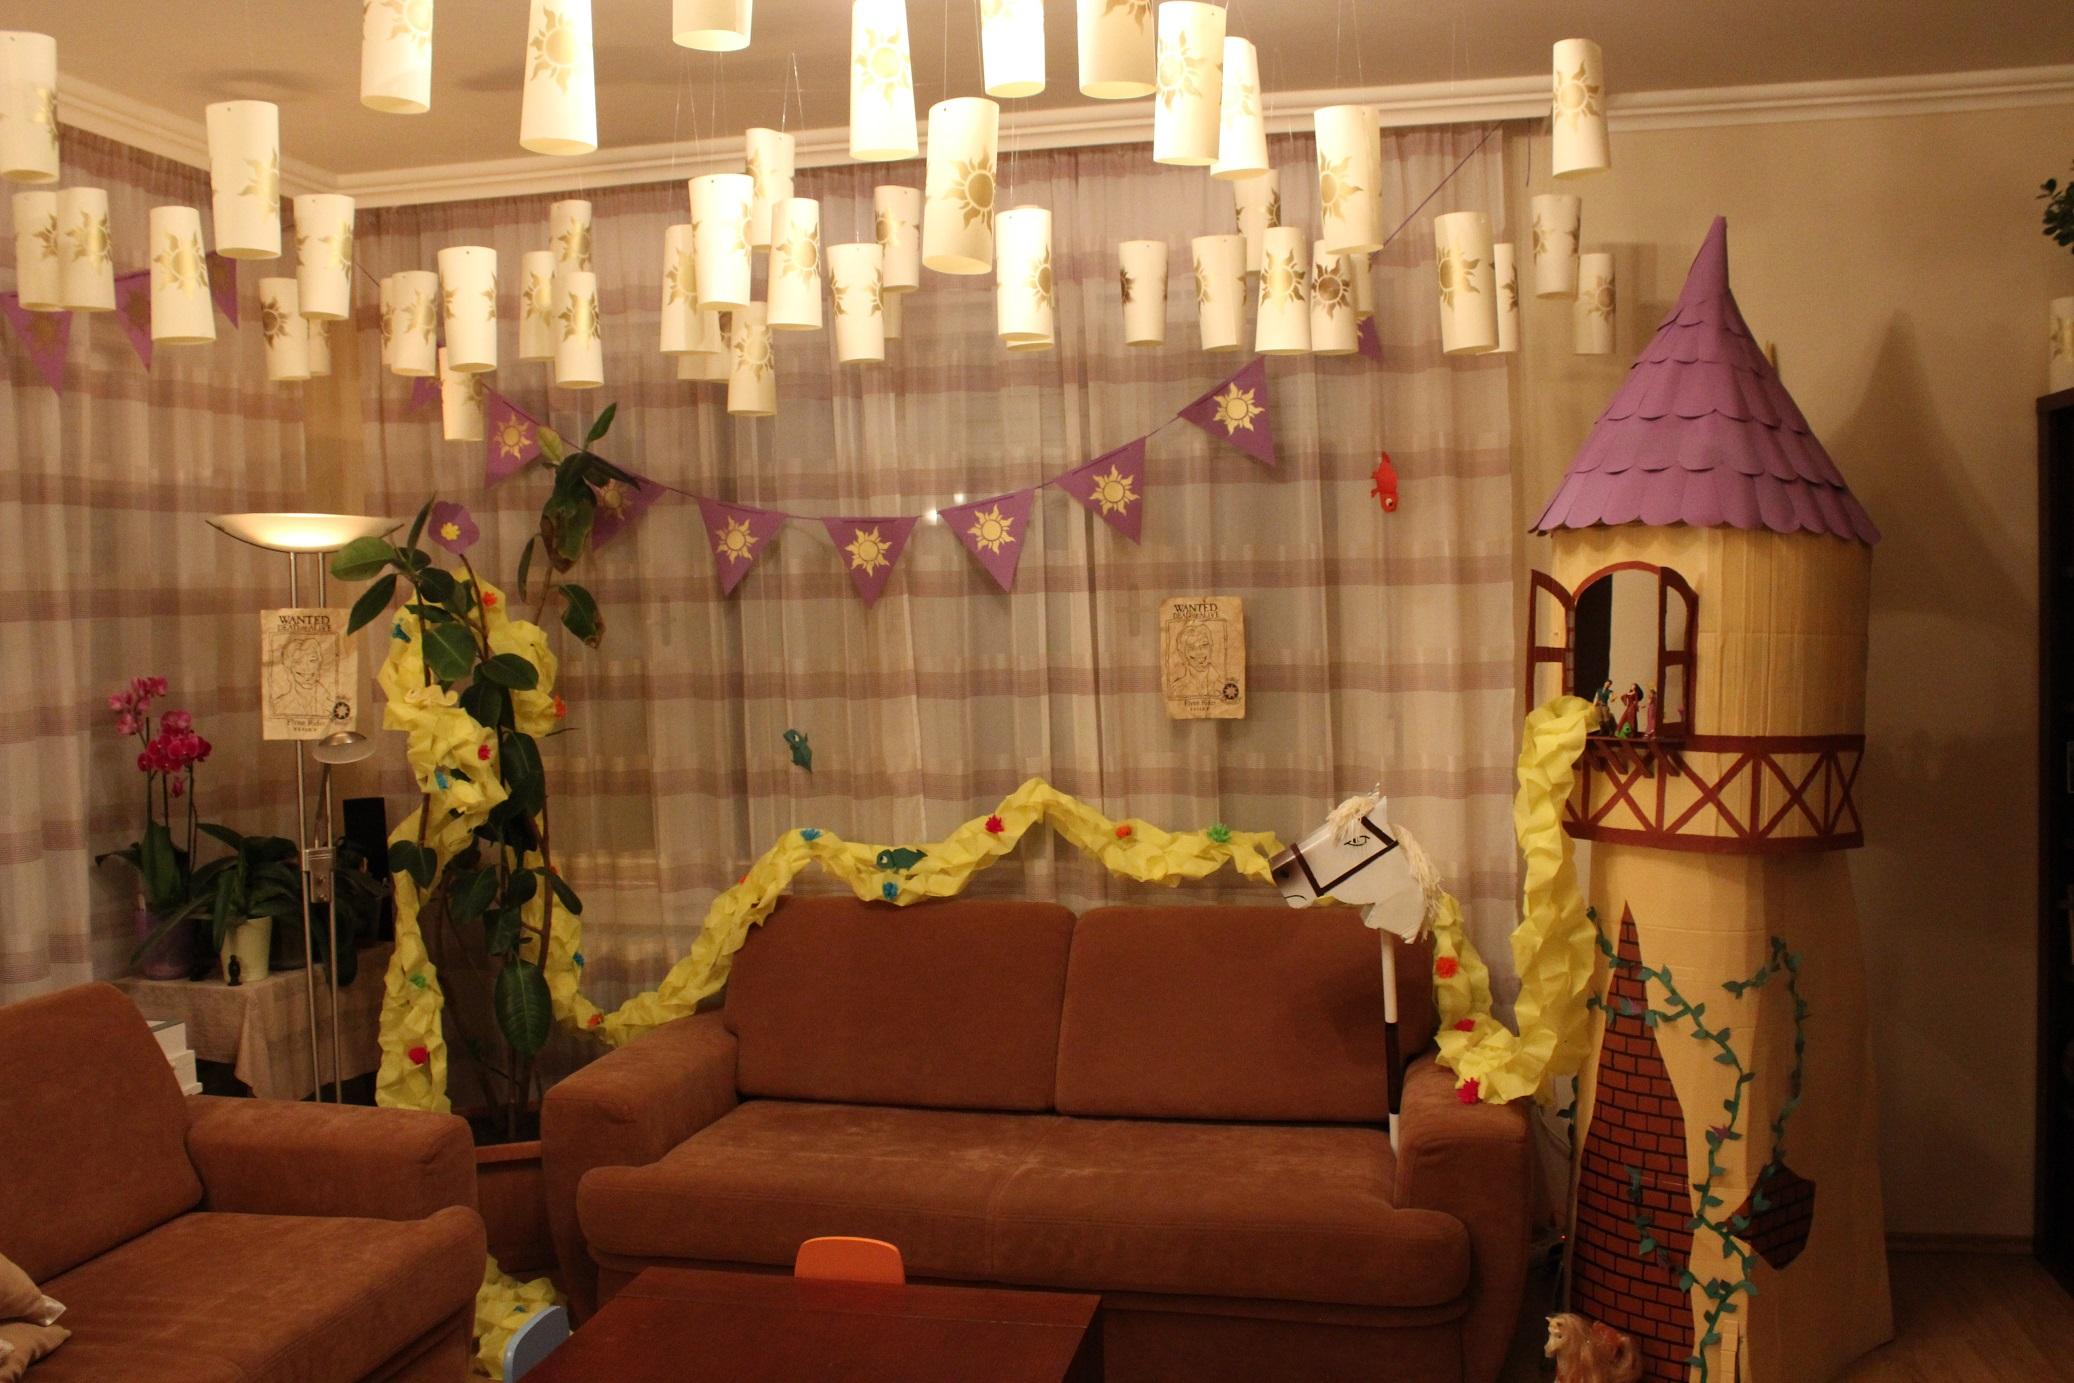 szmk_tangled_aranyhaj_birthday_party_szulinap_dekor_buli_20.JPG